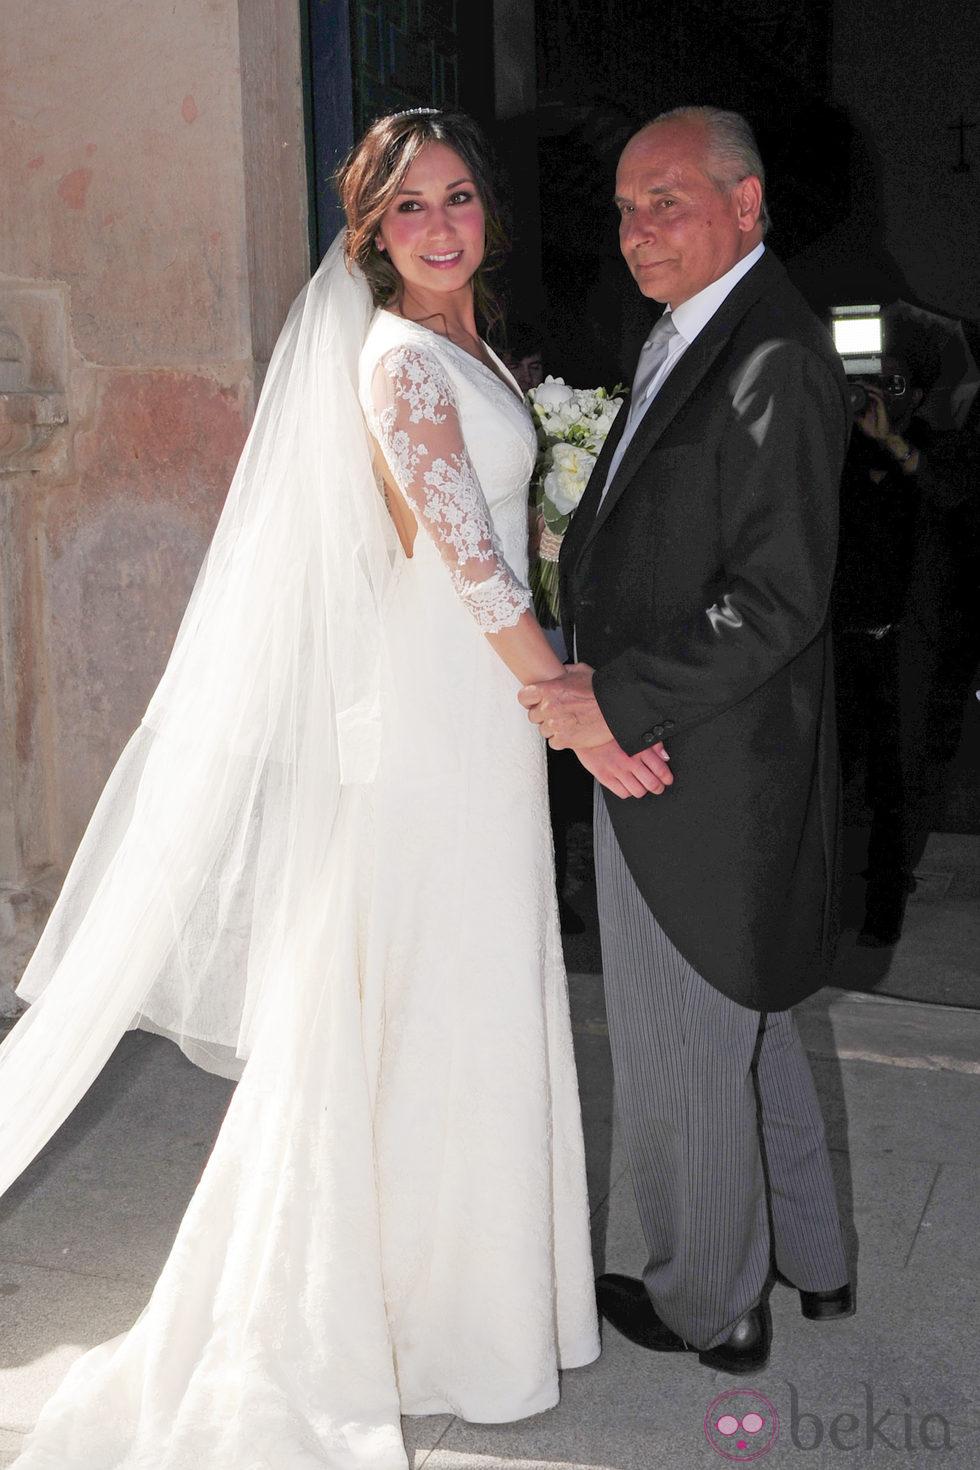 Cristina Sáinz a su llegada a la iglesia de Vegas de Matute (Segovia)